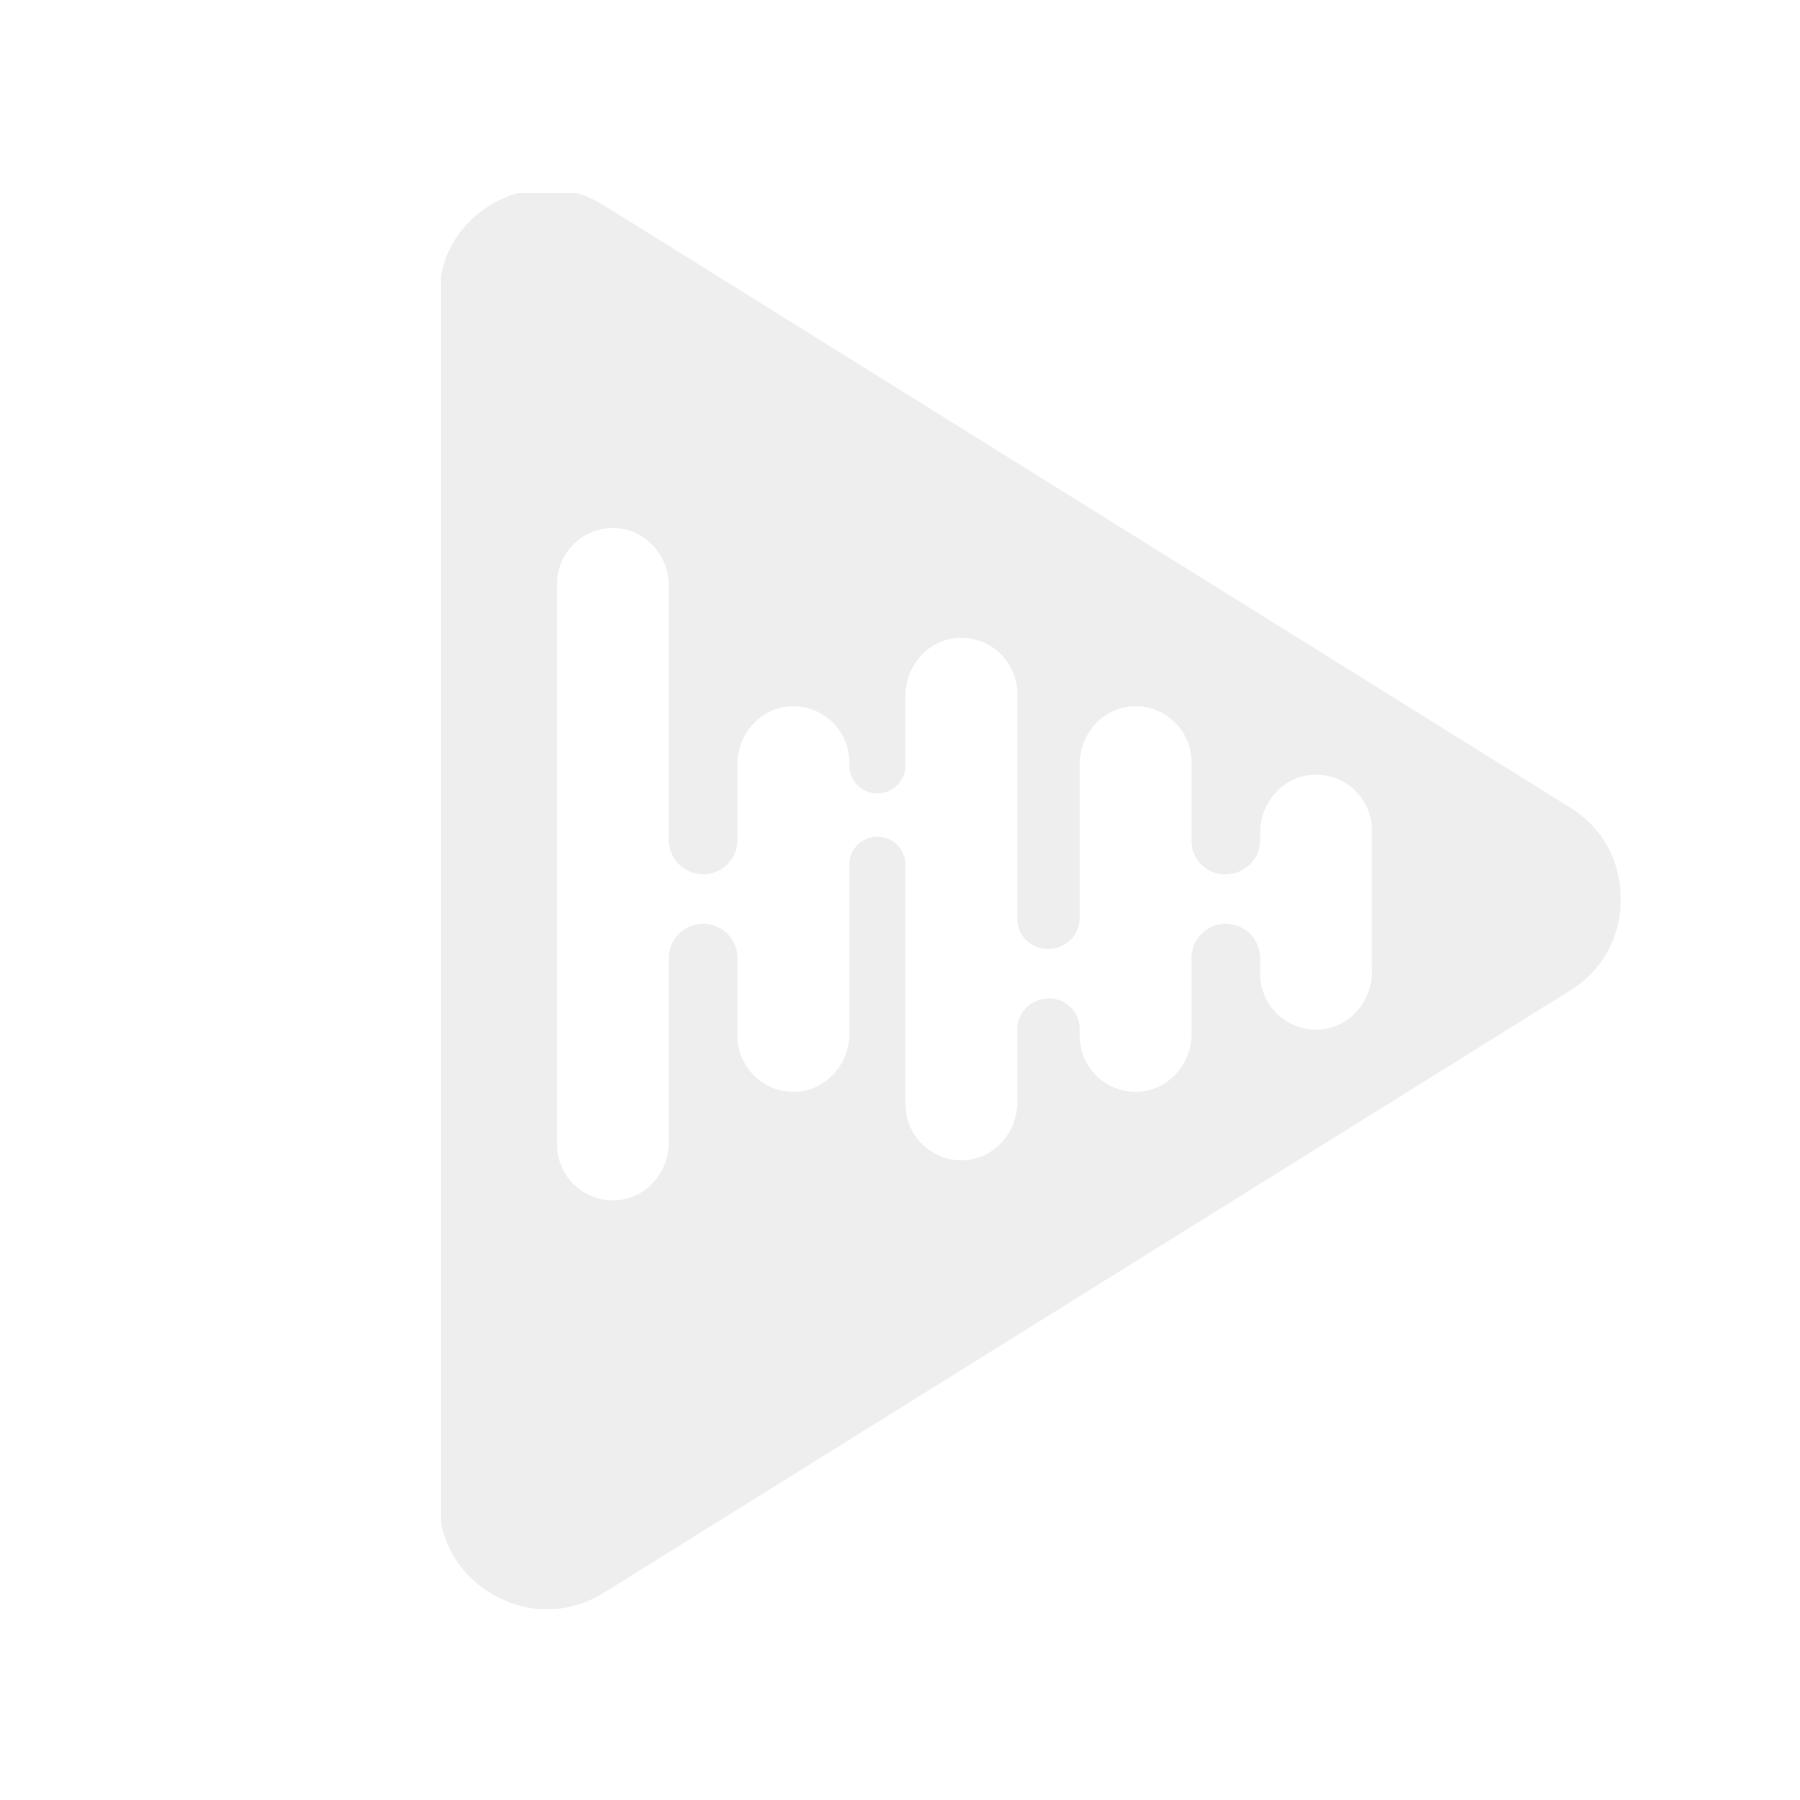 Kufatec Fistune 39702-1